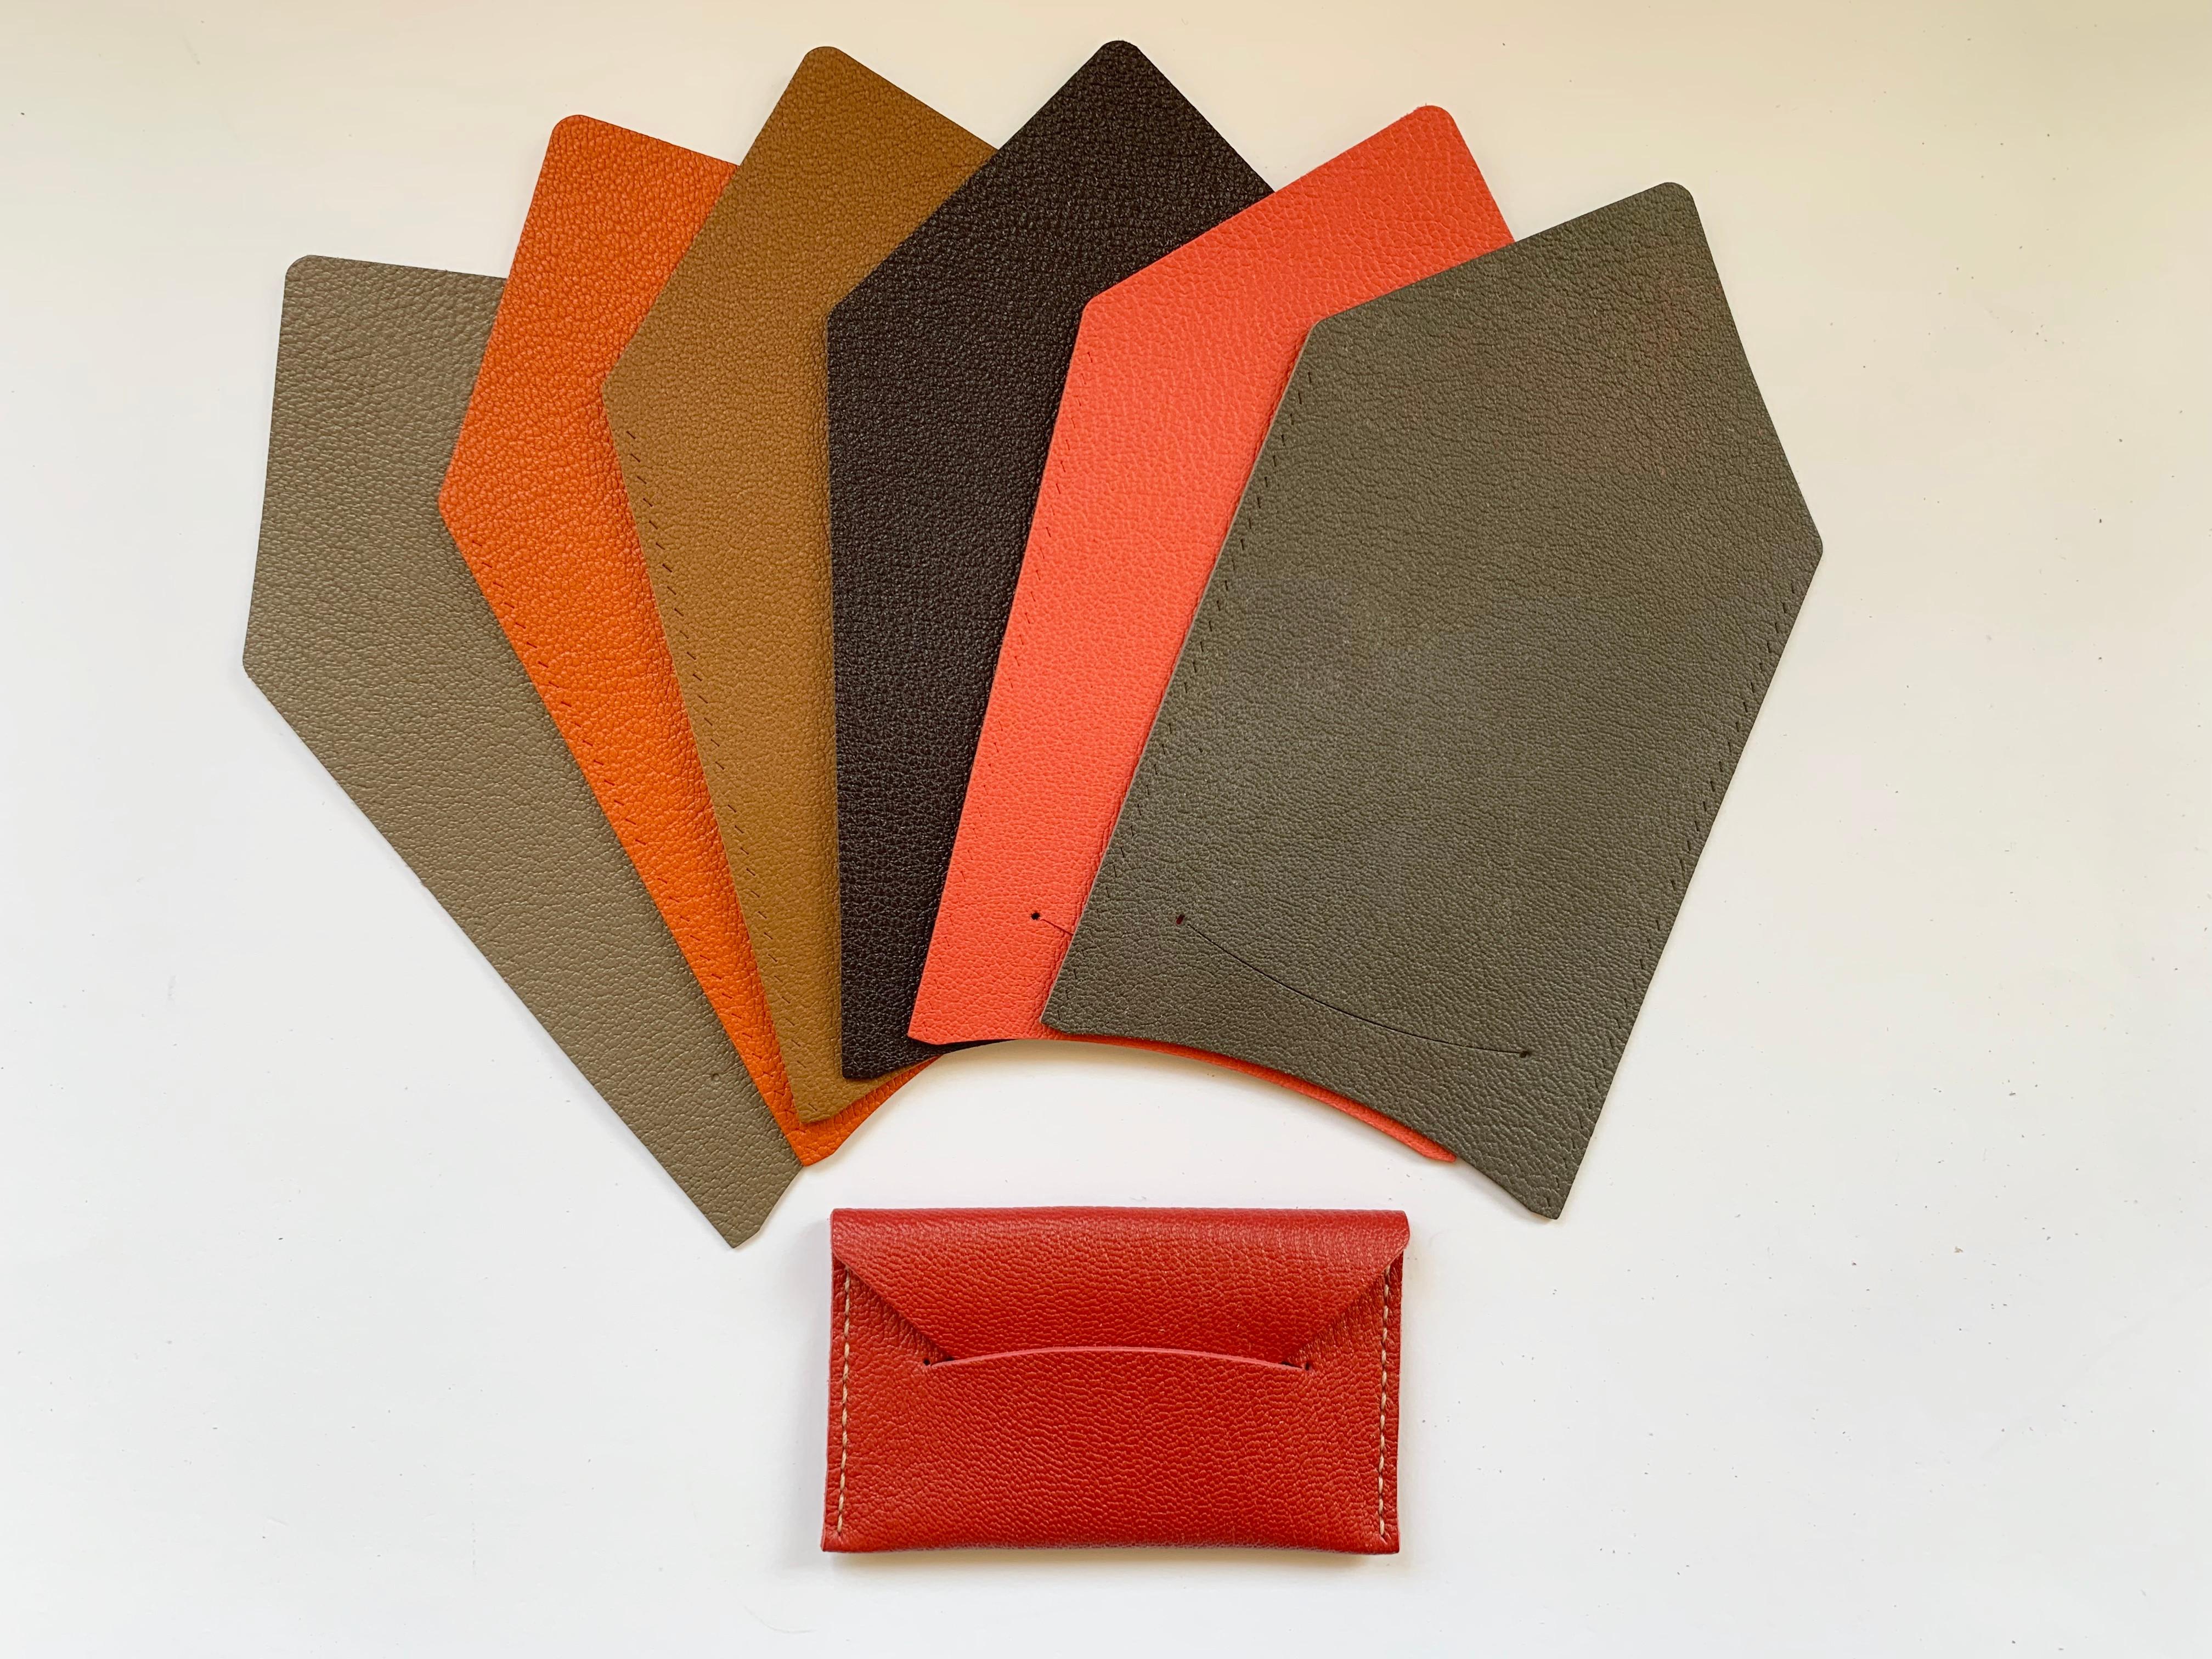 Basic Leather card sleeve workshop